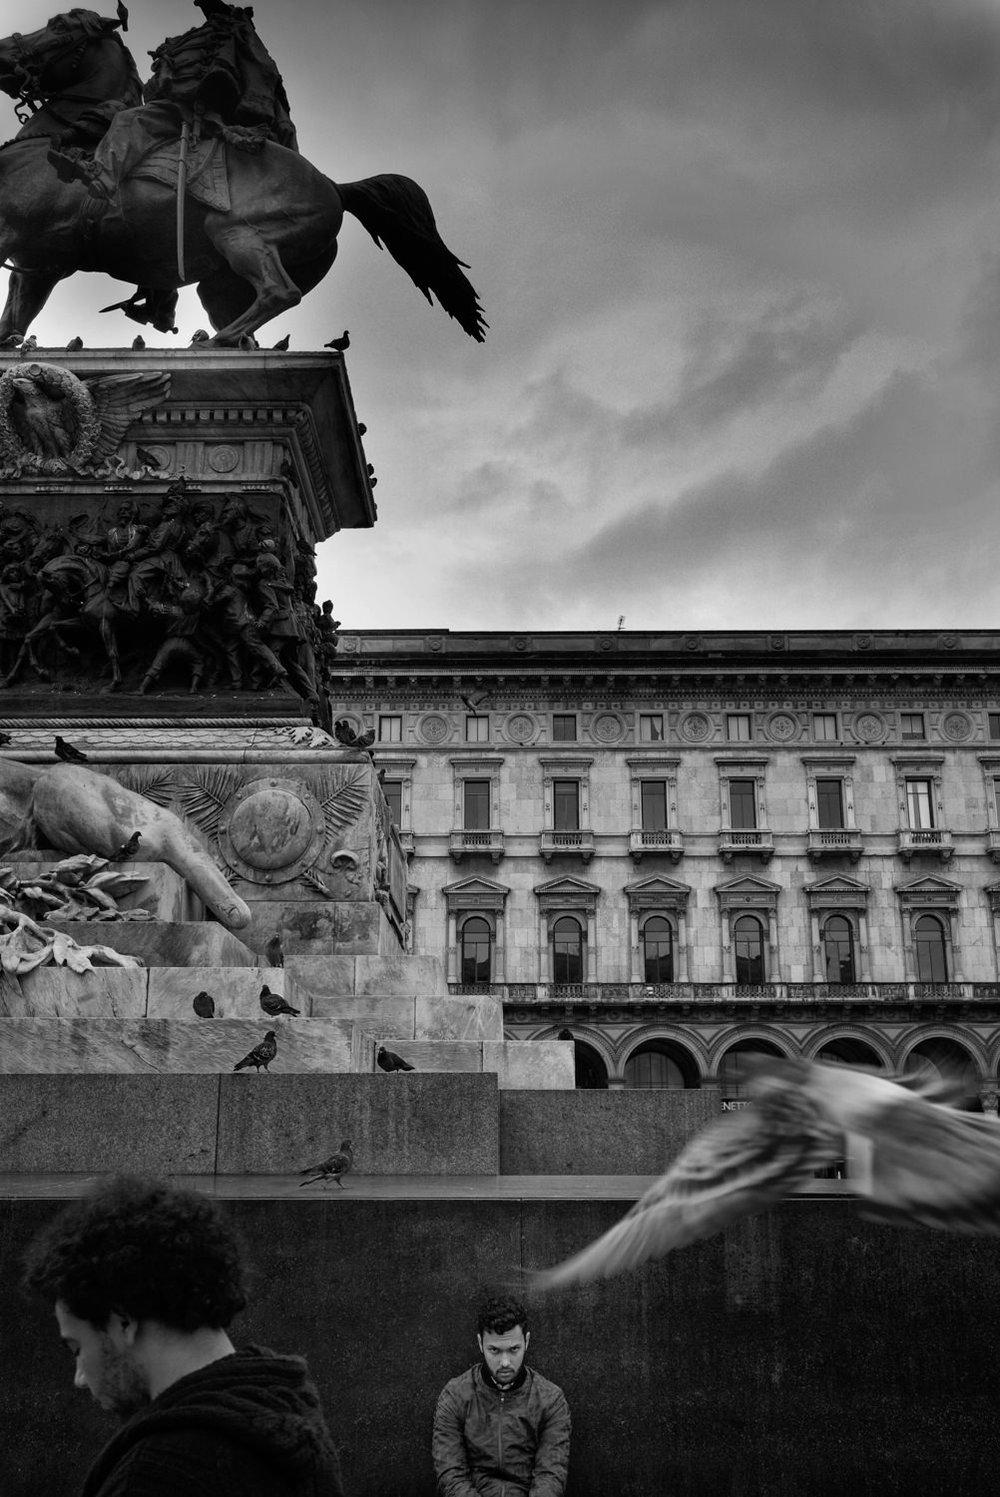 2014-Milano-Eolo-Perfido-Street-Photography-002.jpg